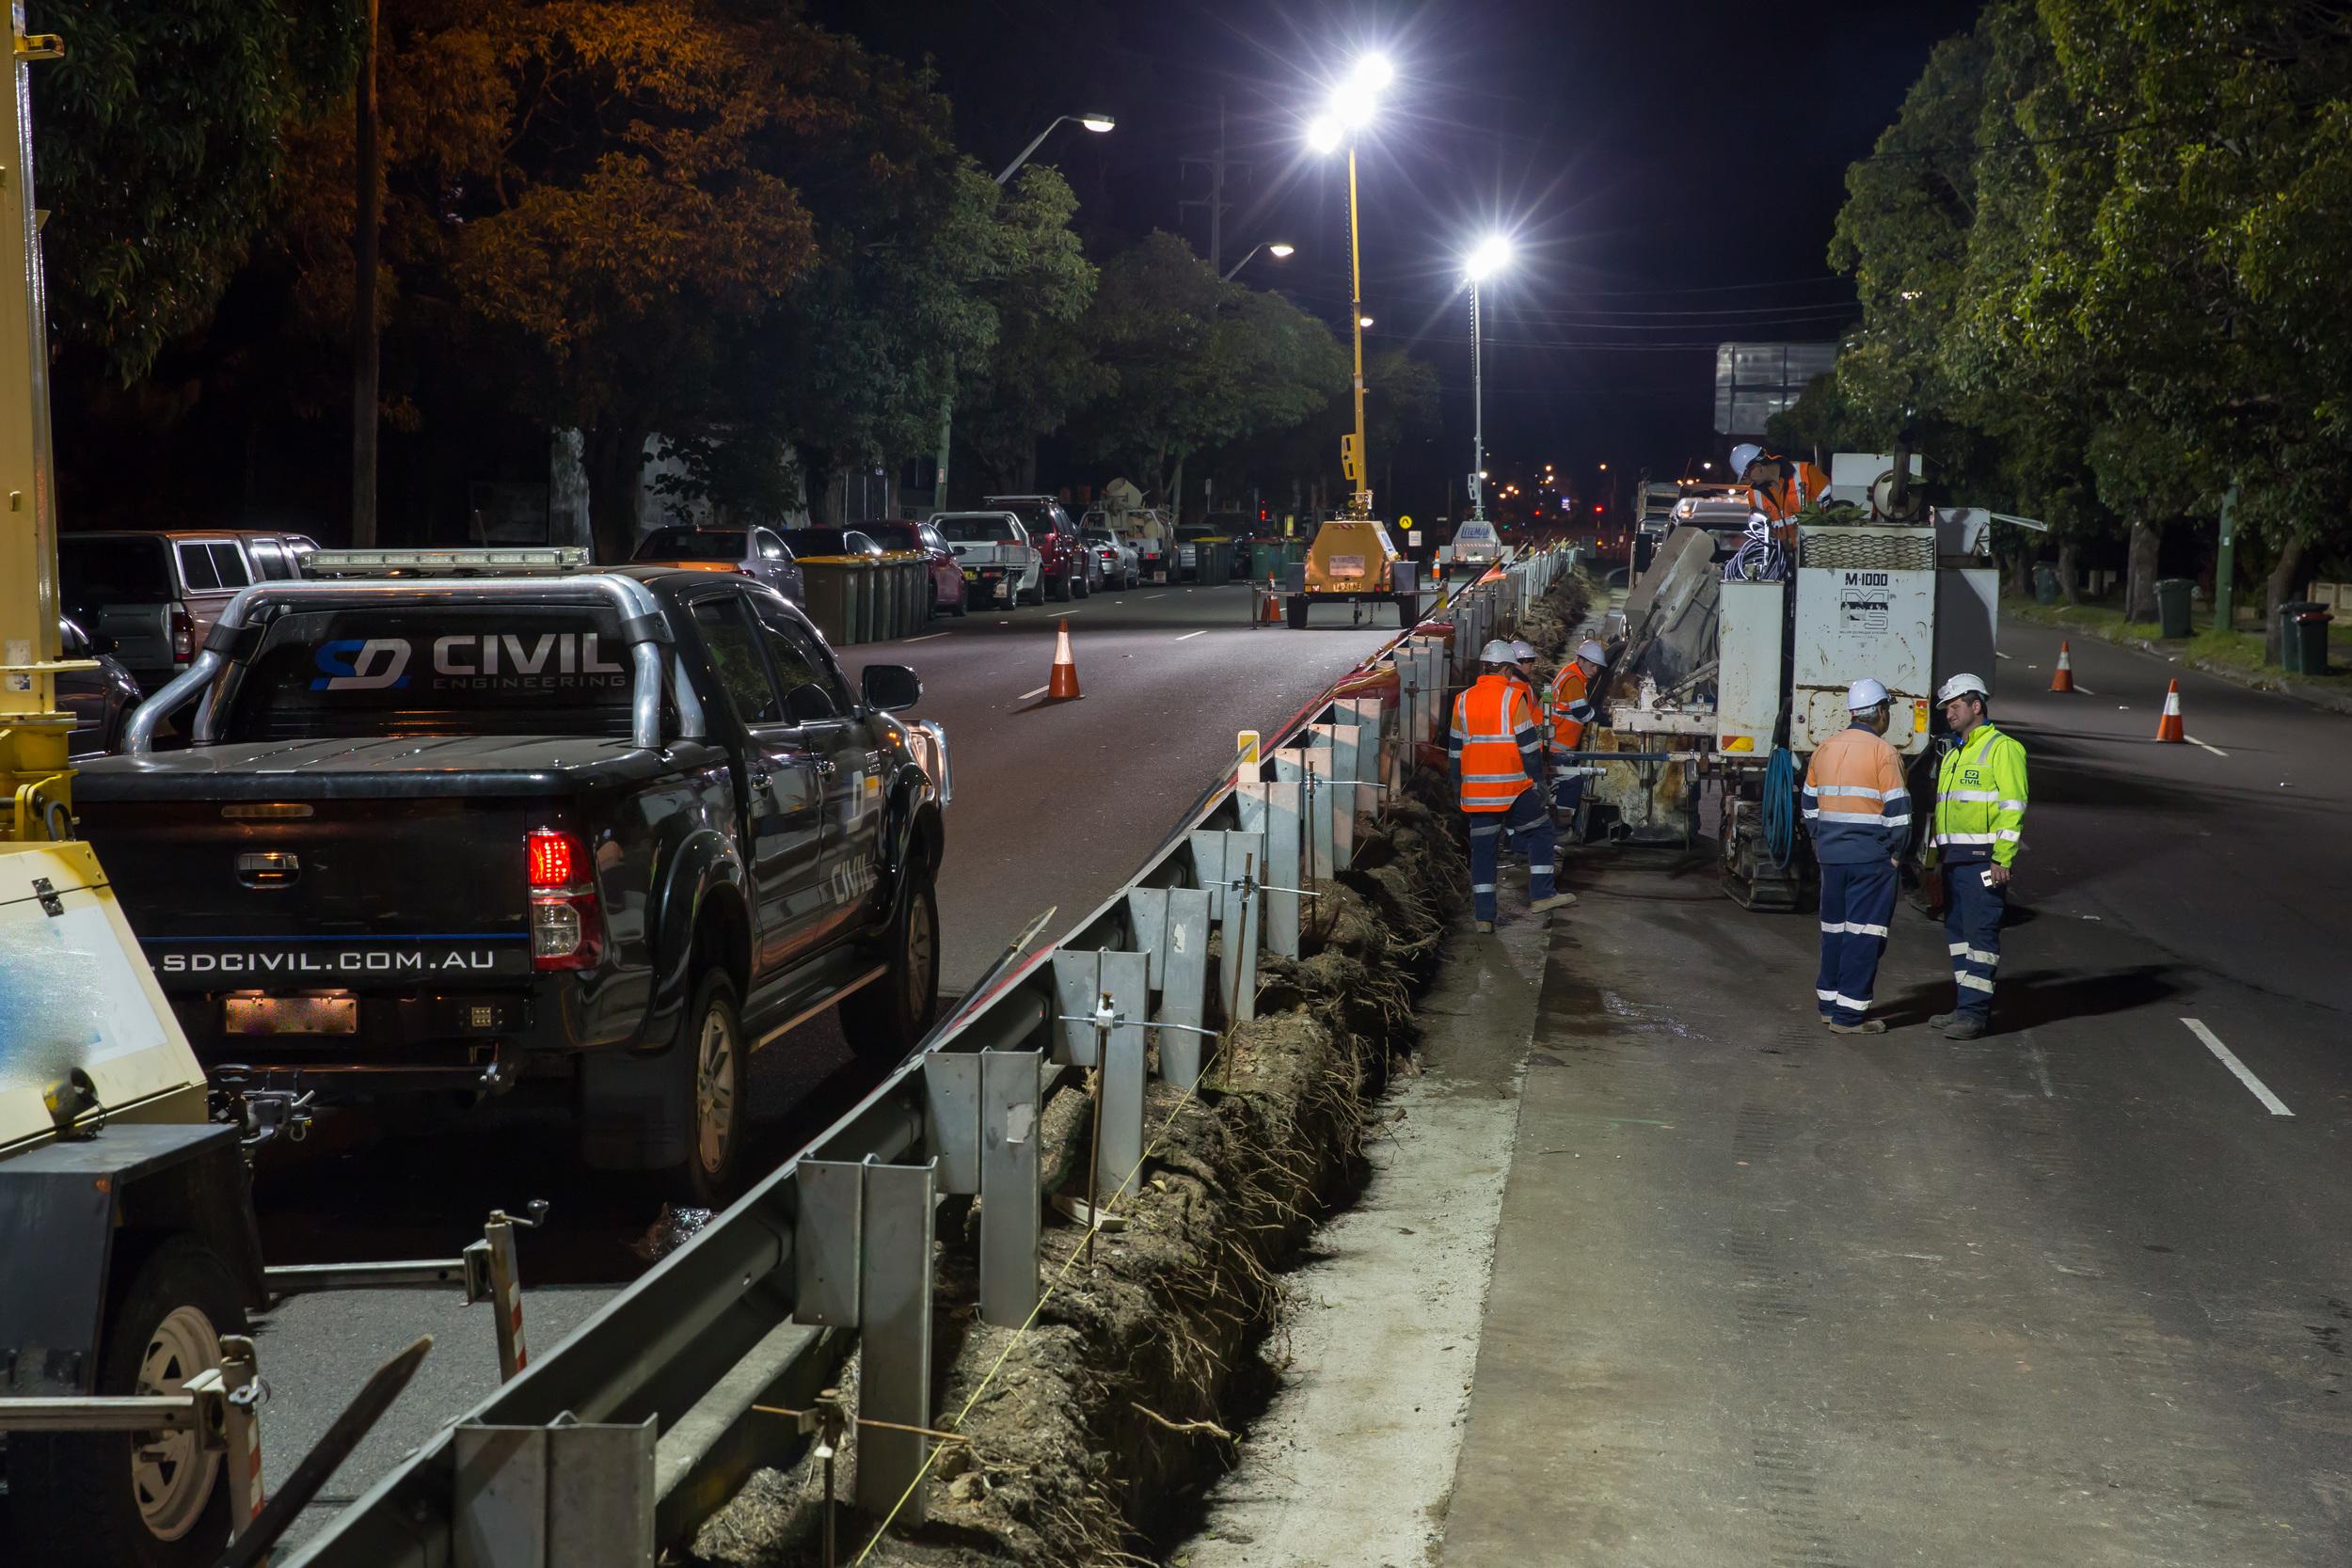 sd civil-all concrete-sydney roadworks